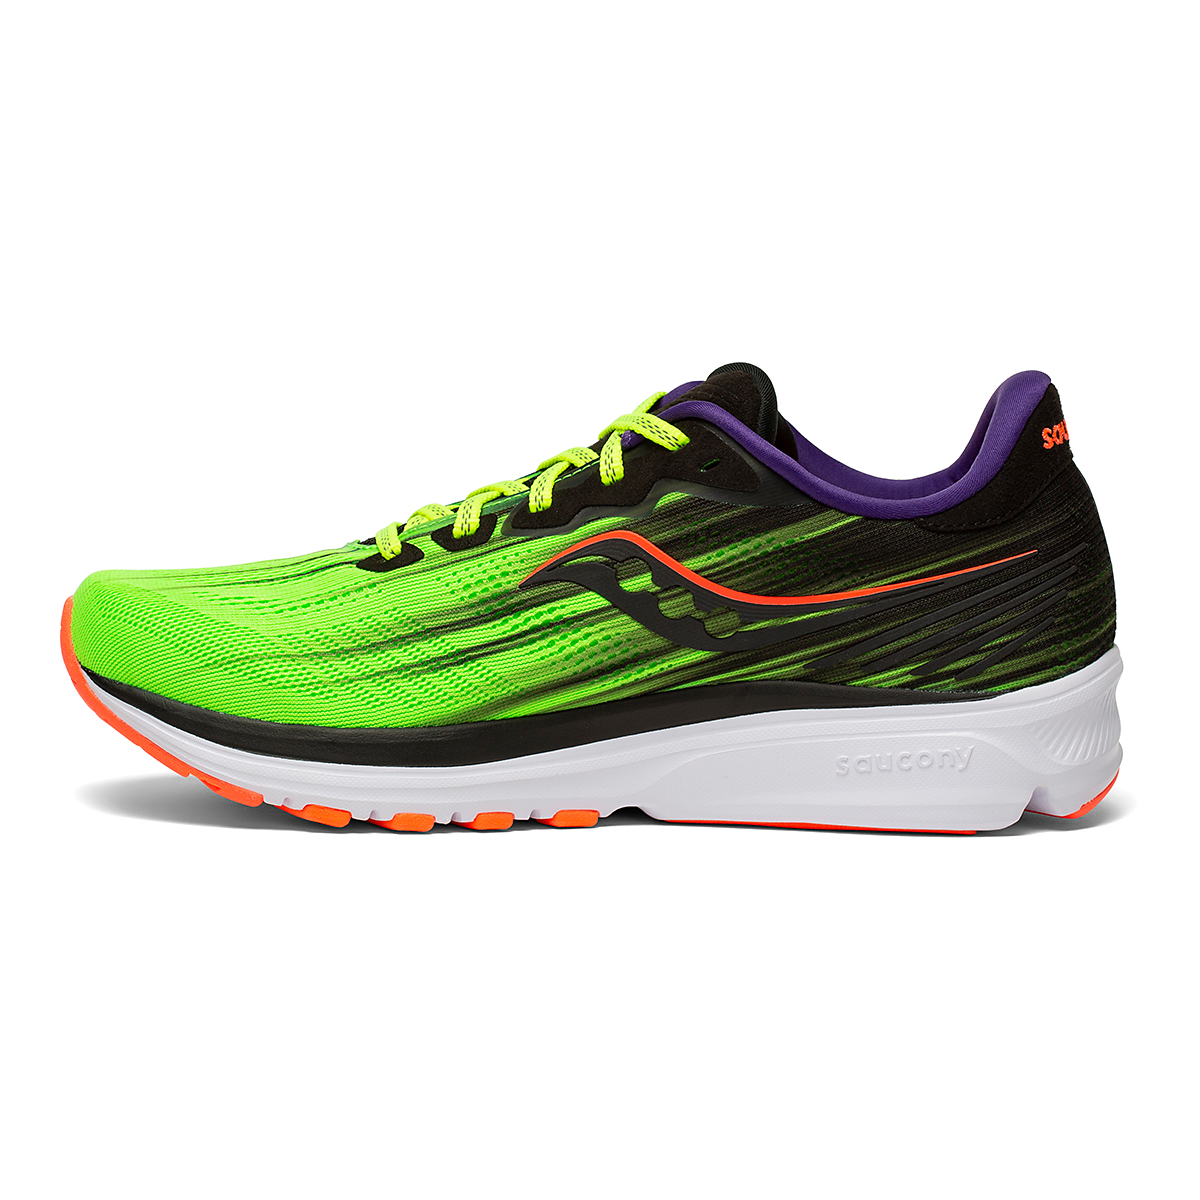 Men's Saucony Ride 14 Running Shoe - Color: Vizipro - Size: 7 - Width: Regular, Vizipro, large, image 2